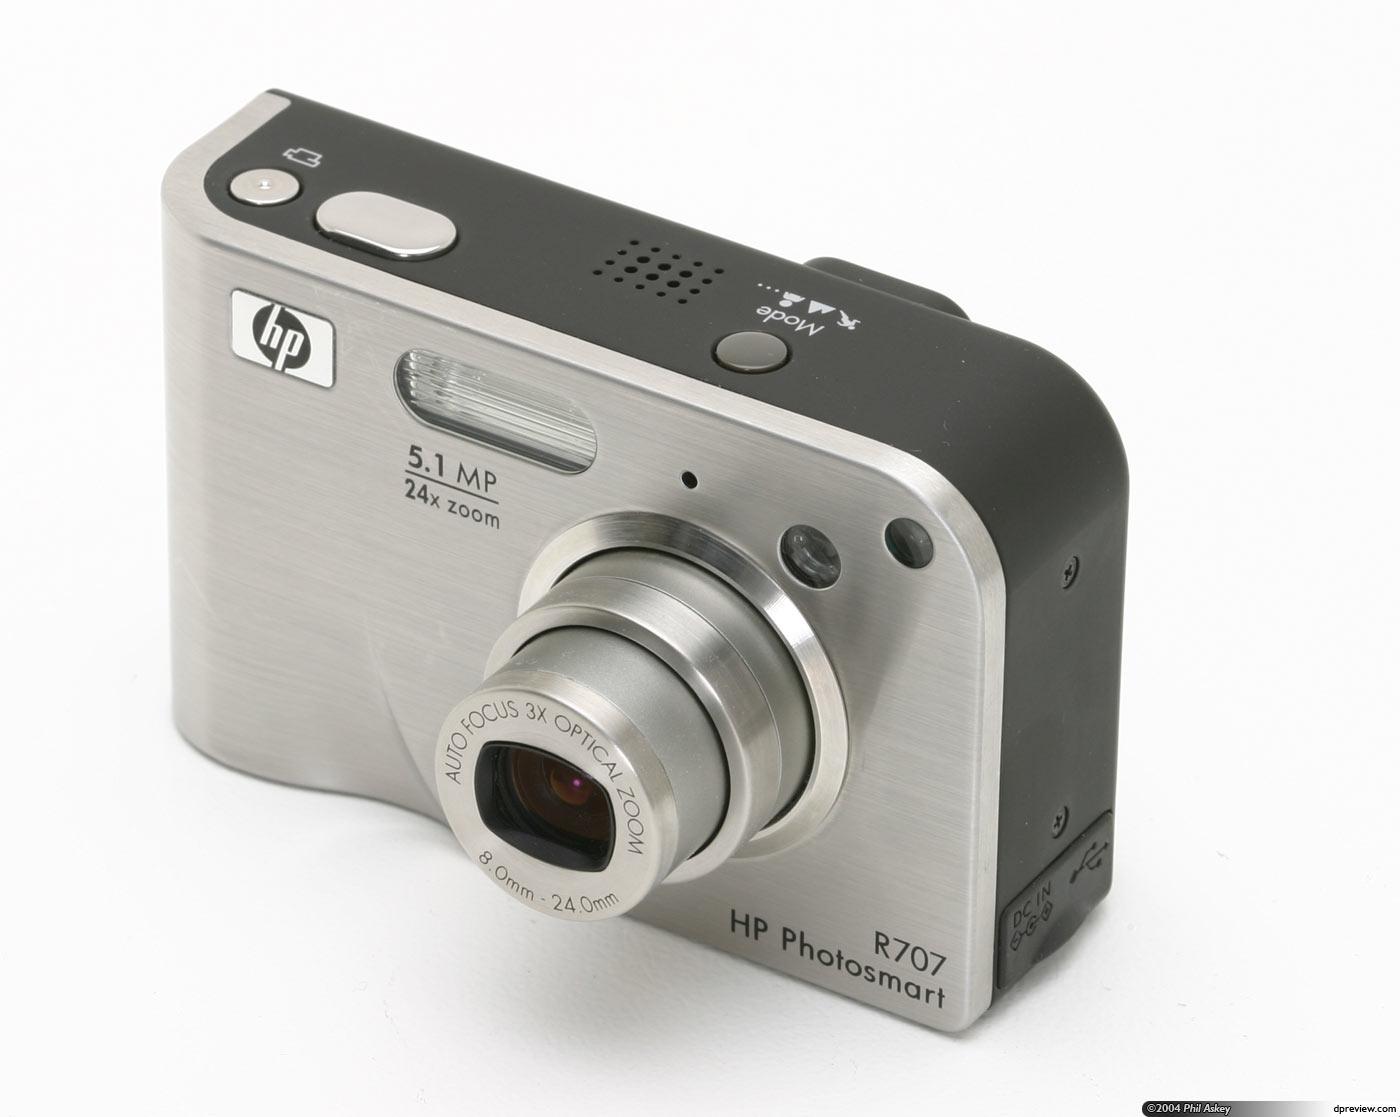 Camera digital hp photosmart